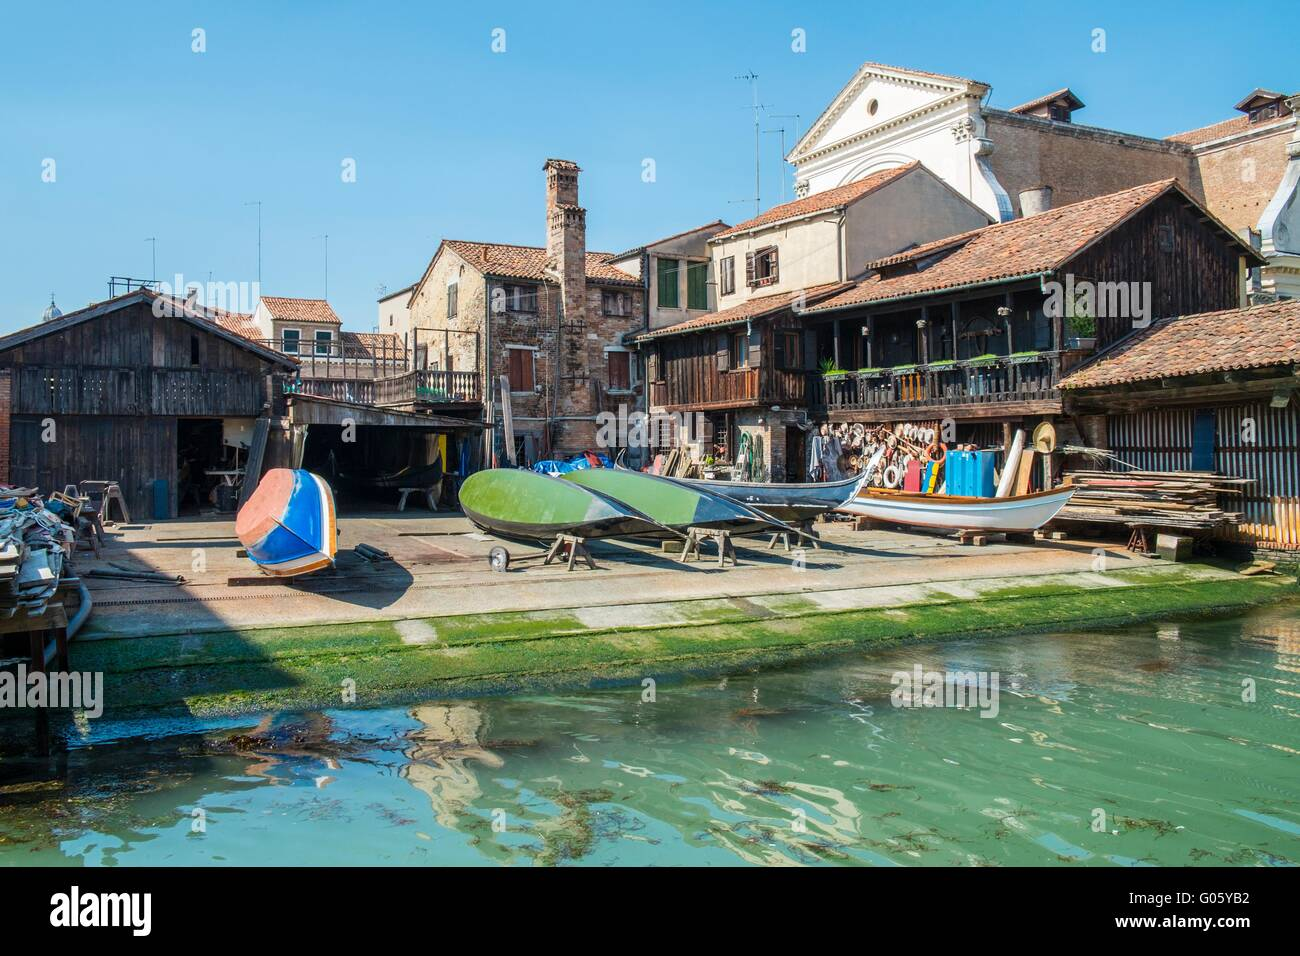 Reparatur-Werft auf dem Rio de San Trovaso Kanal, Venedig, Italien, April Stockbild